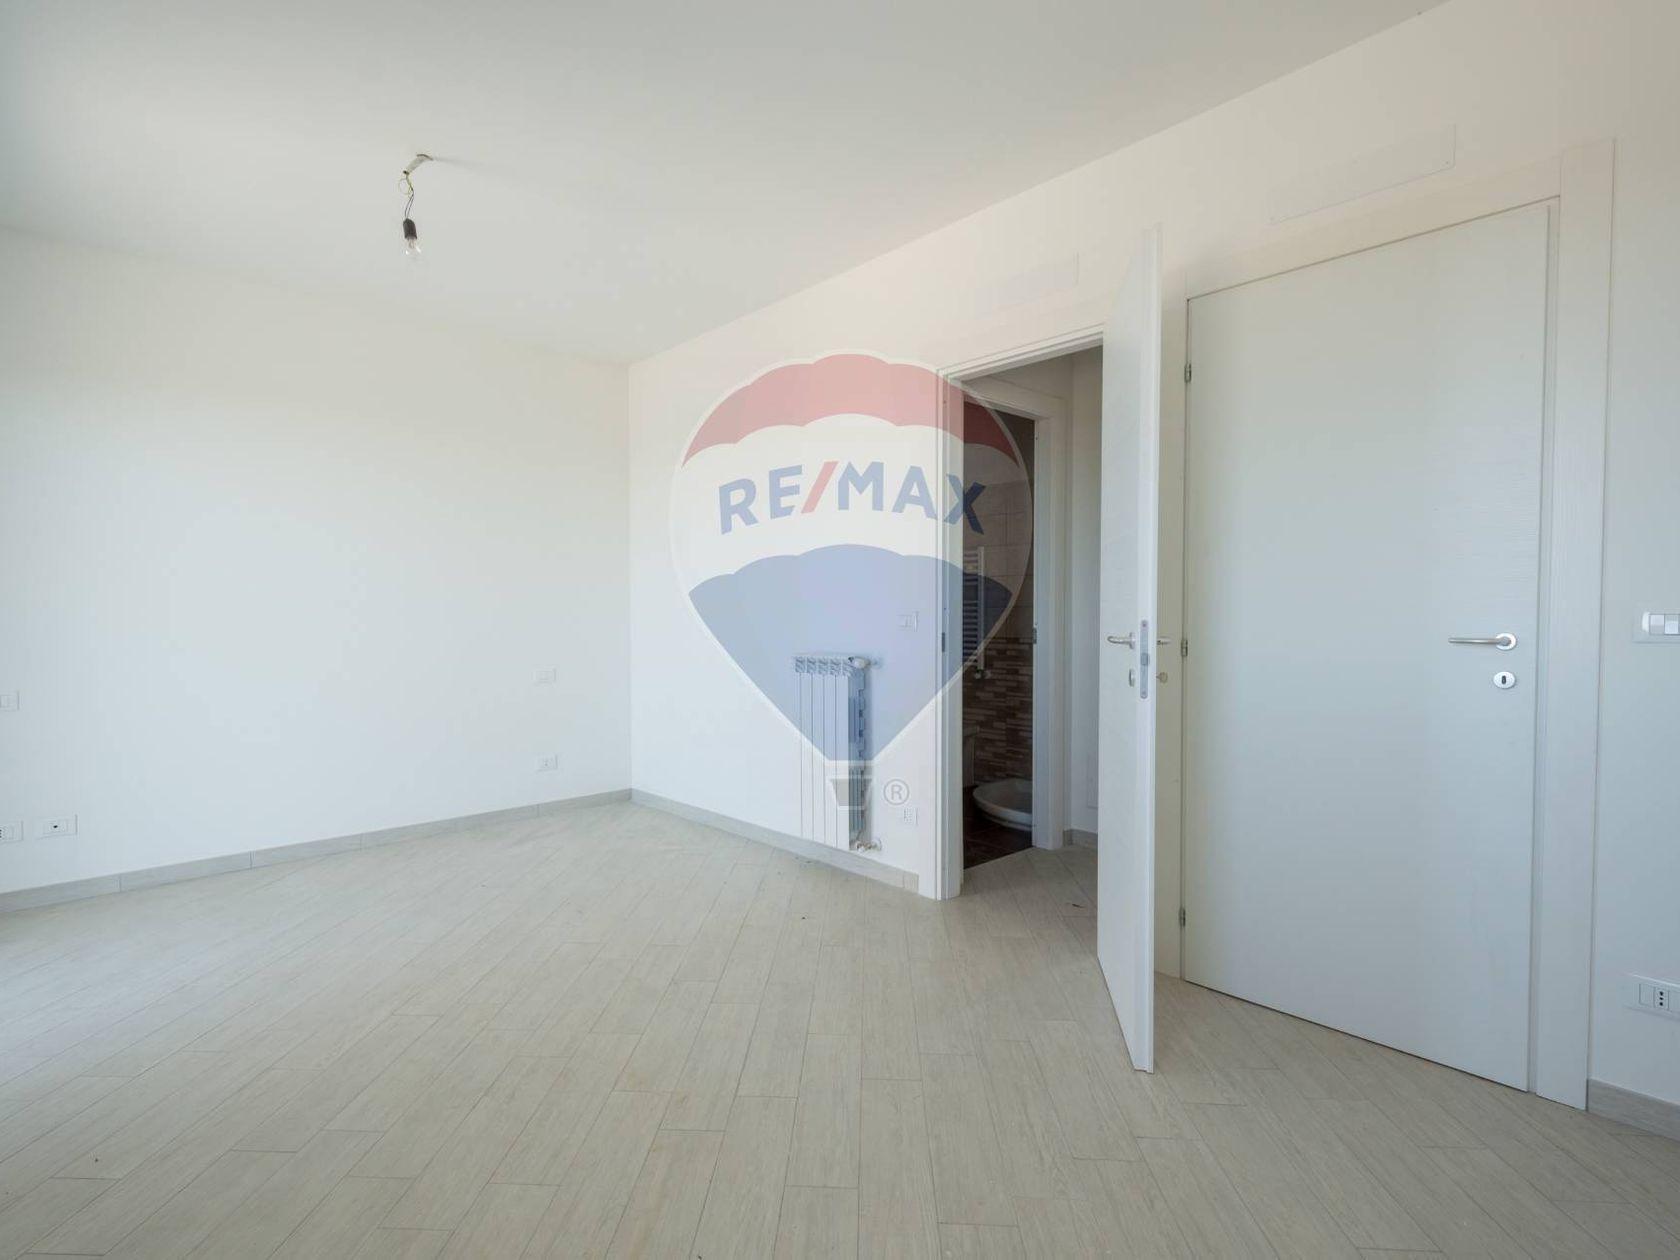 Appartamento Ara Nova, Fiumicino, RM Vendita - Foto 15